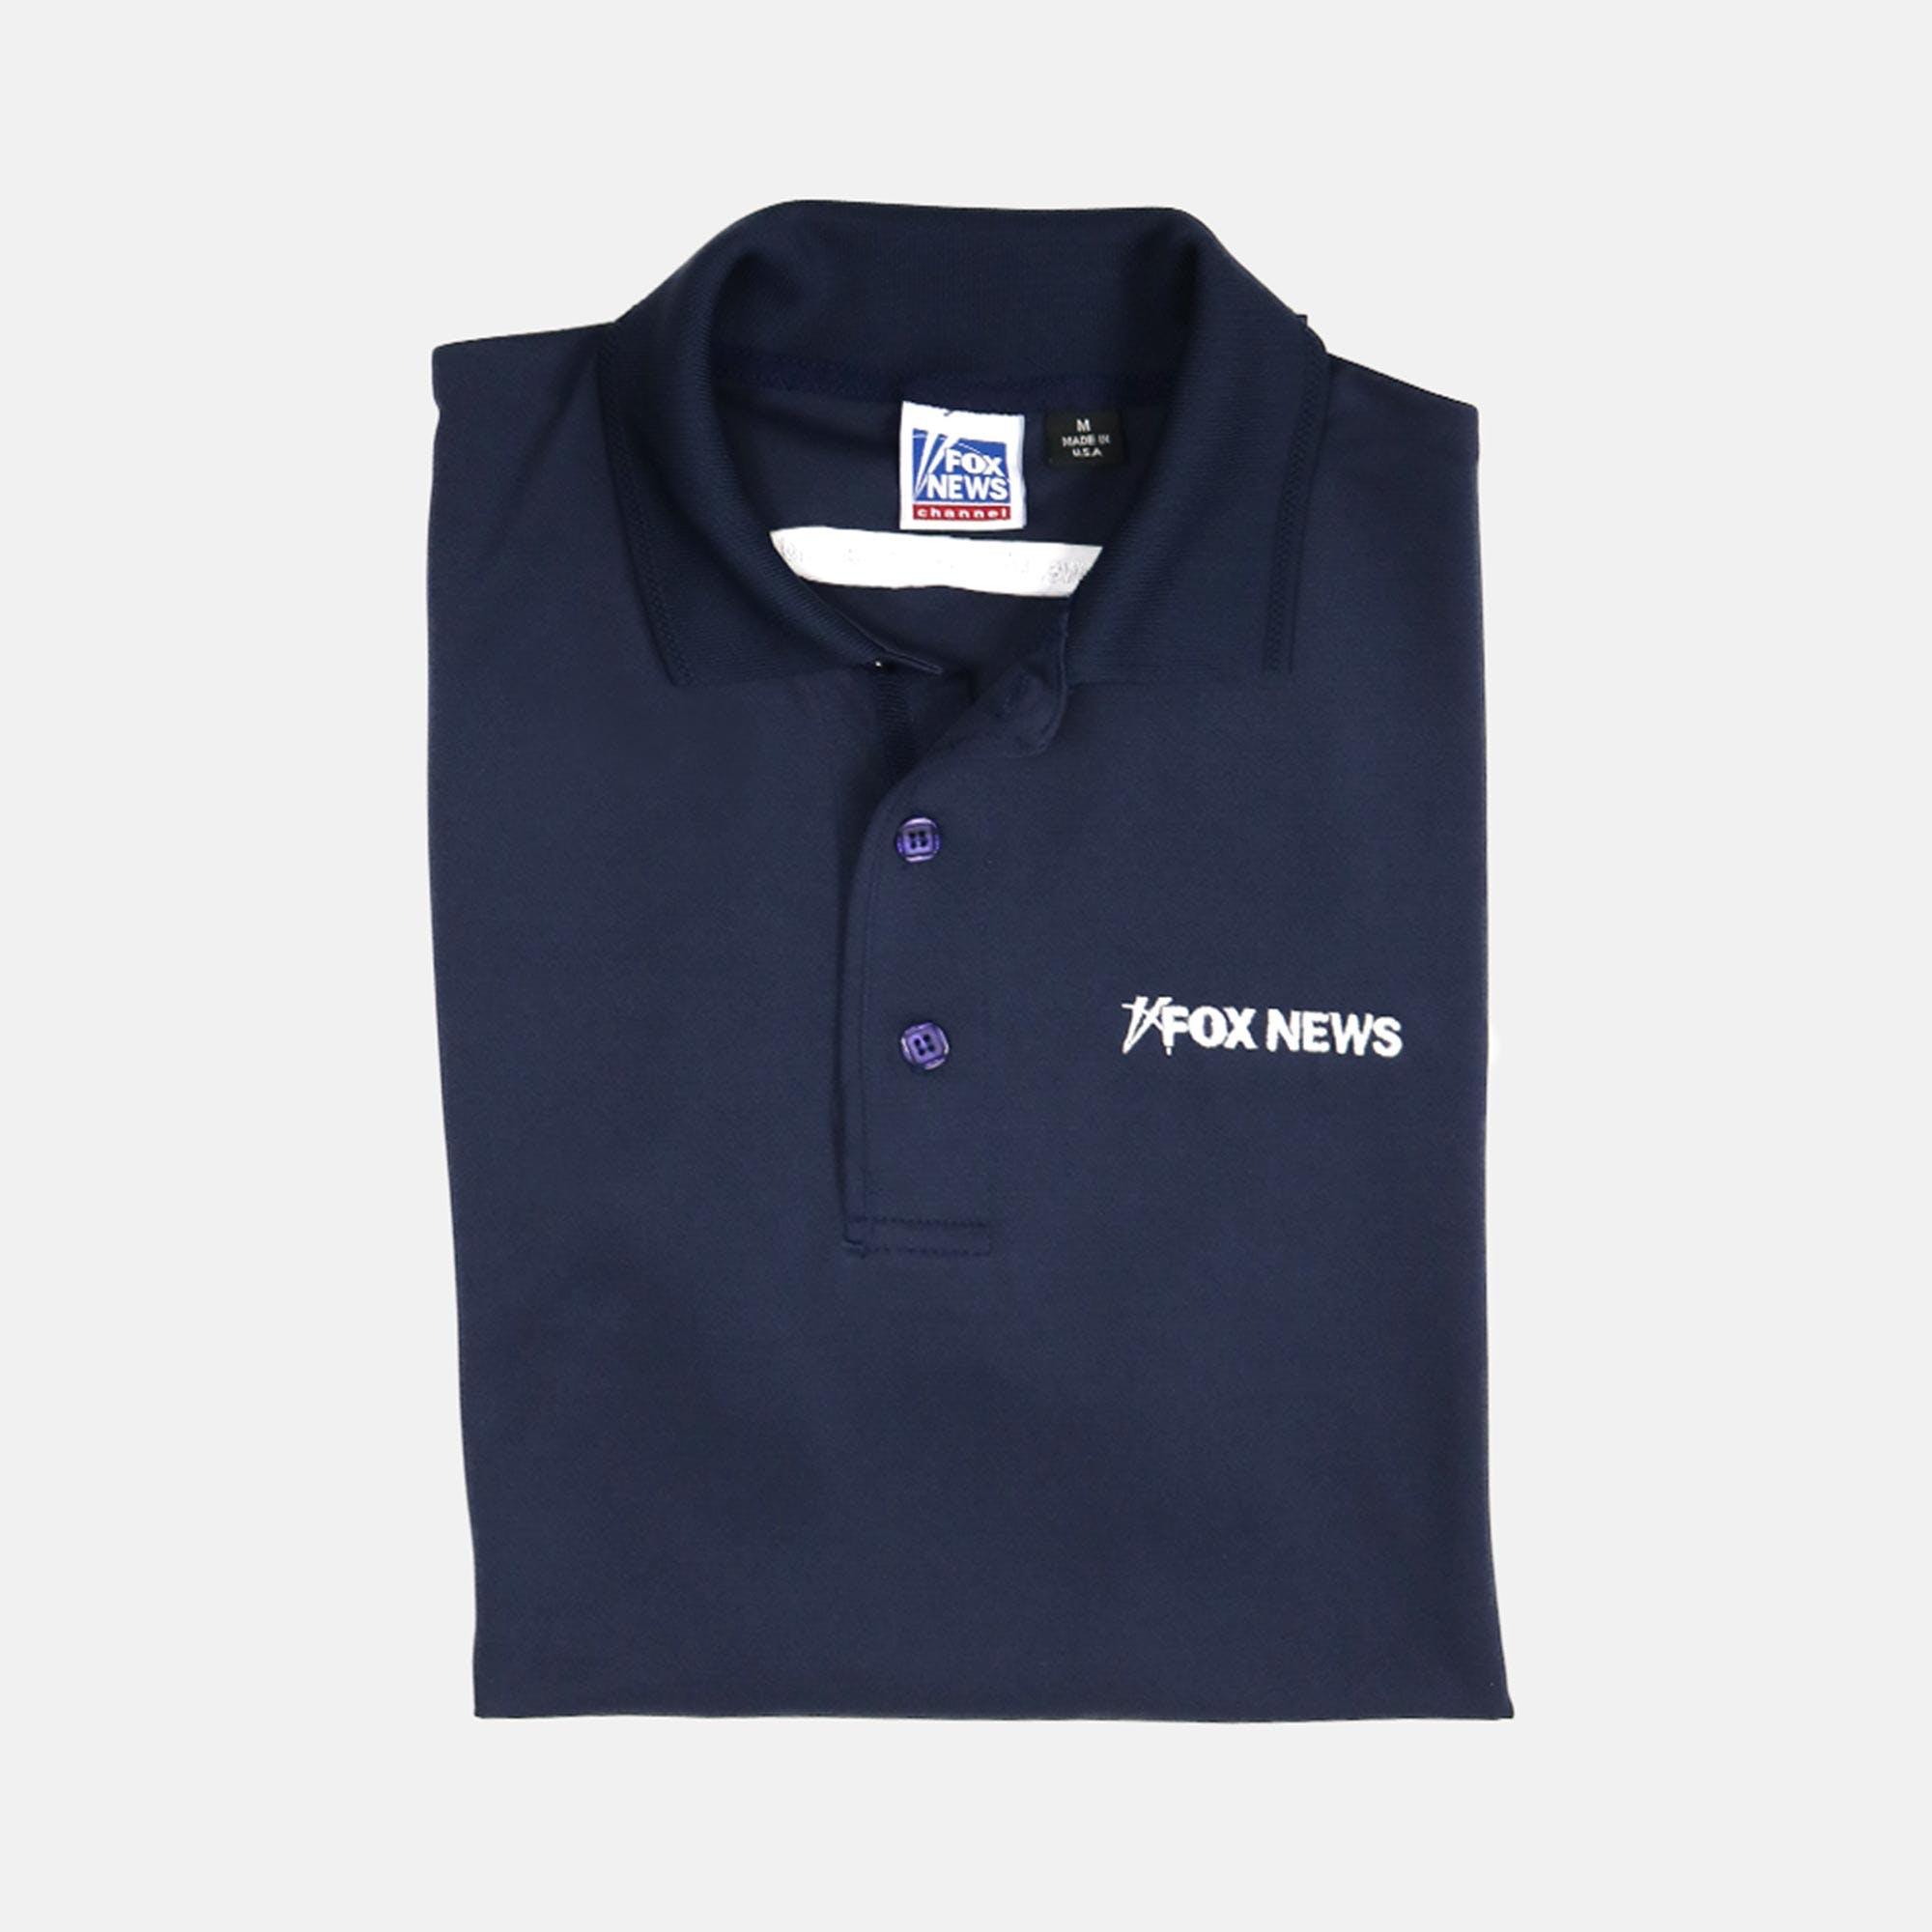 Men S Performance Polo Fox News Shop